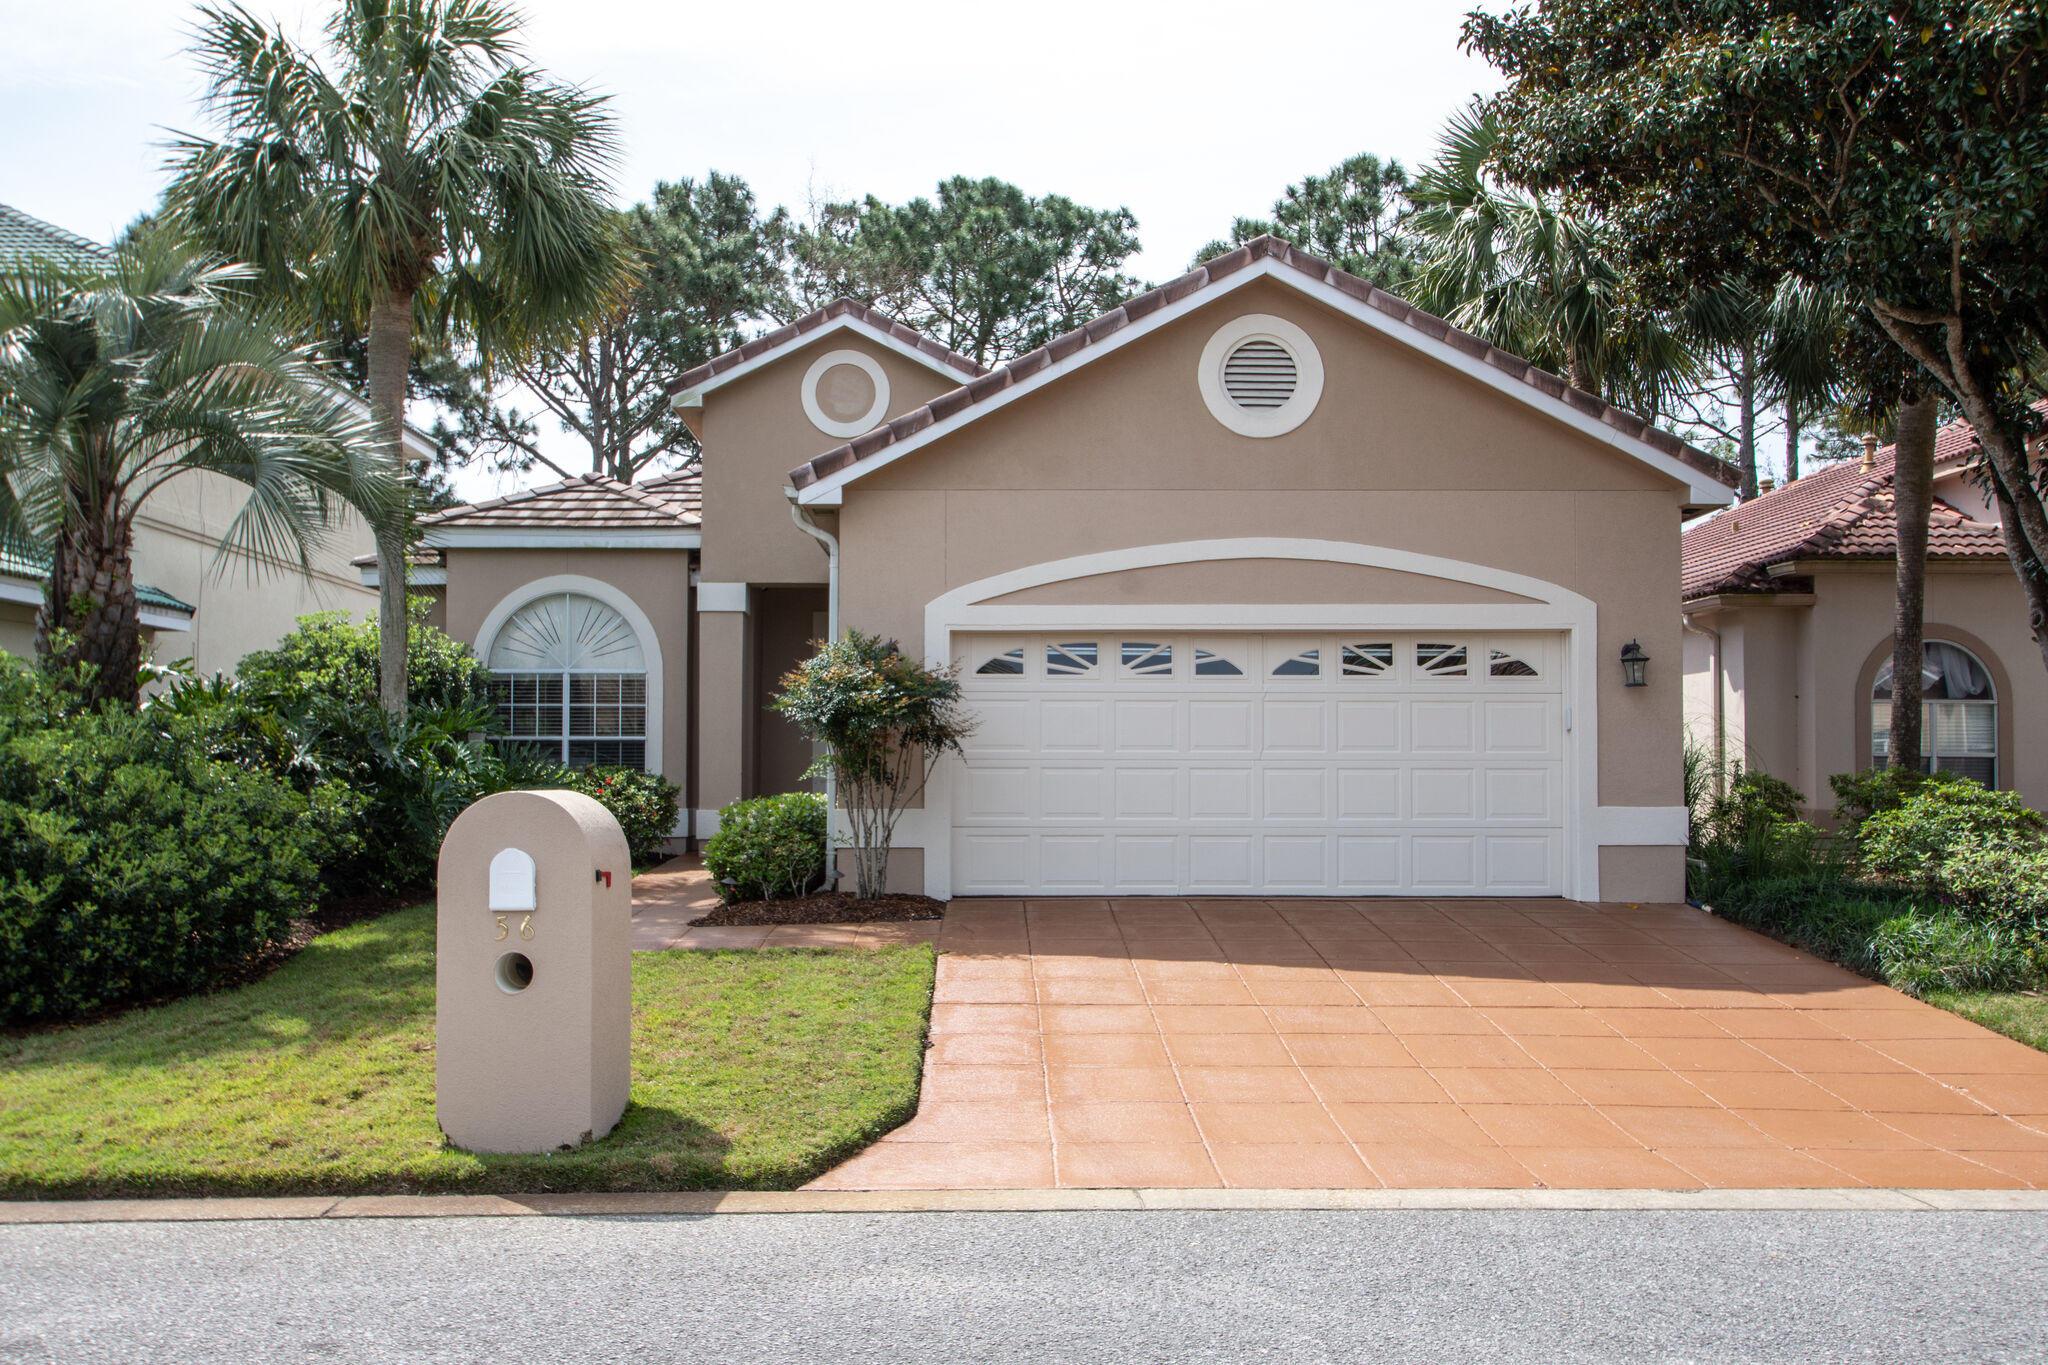 Photo of home for sale at 56 Indigo, Miramar Beach FL